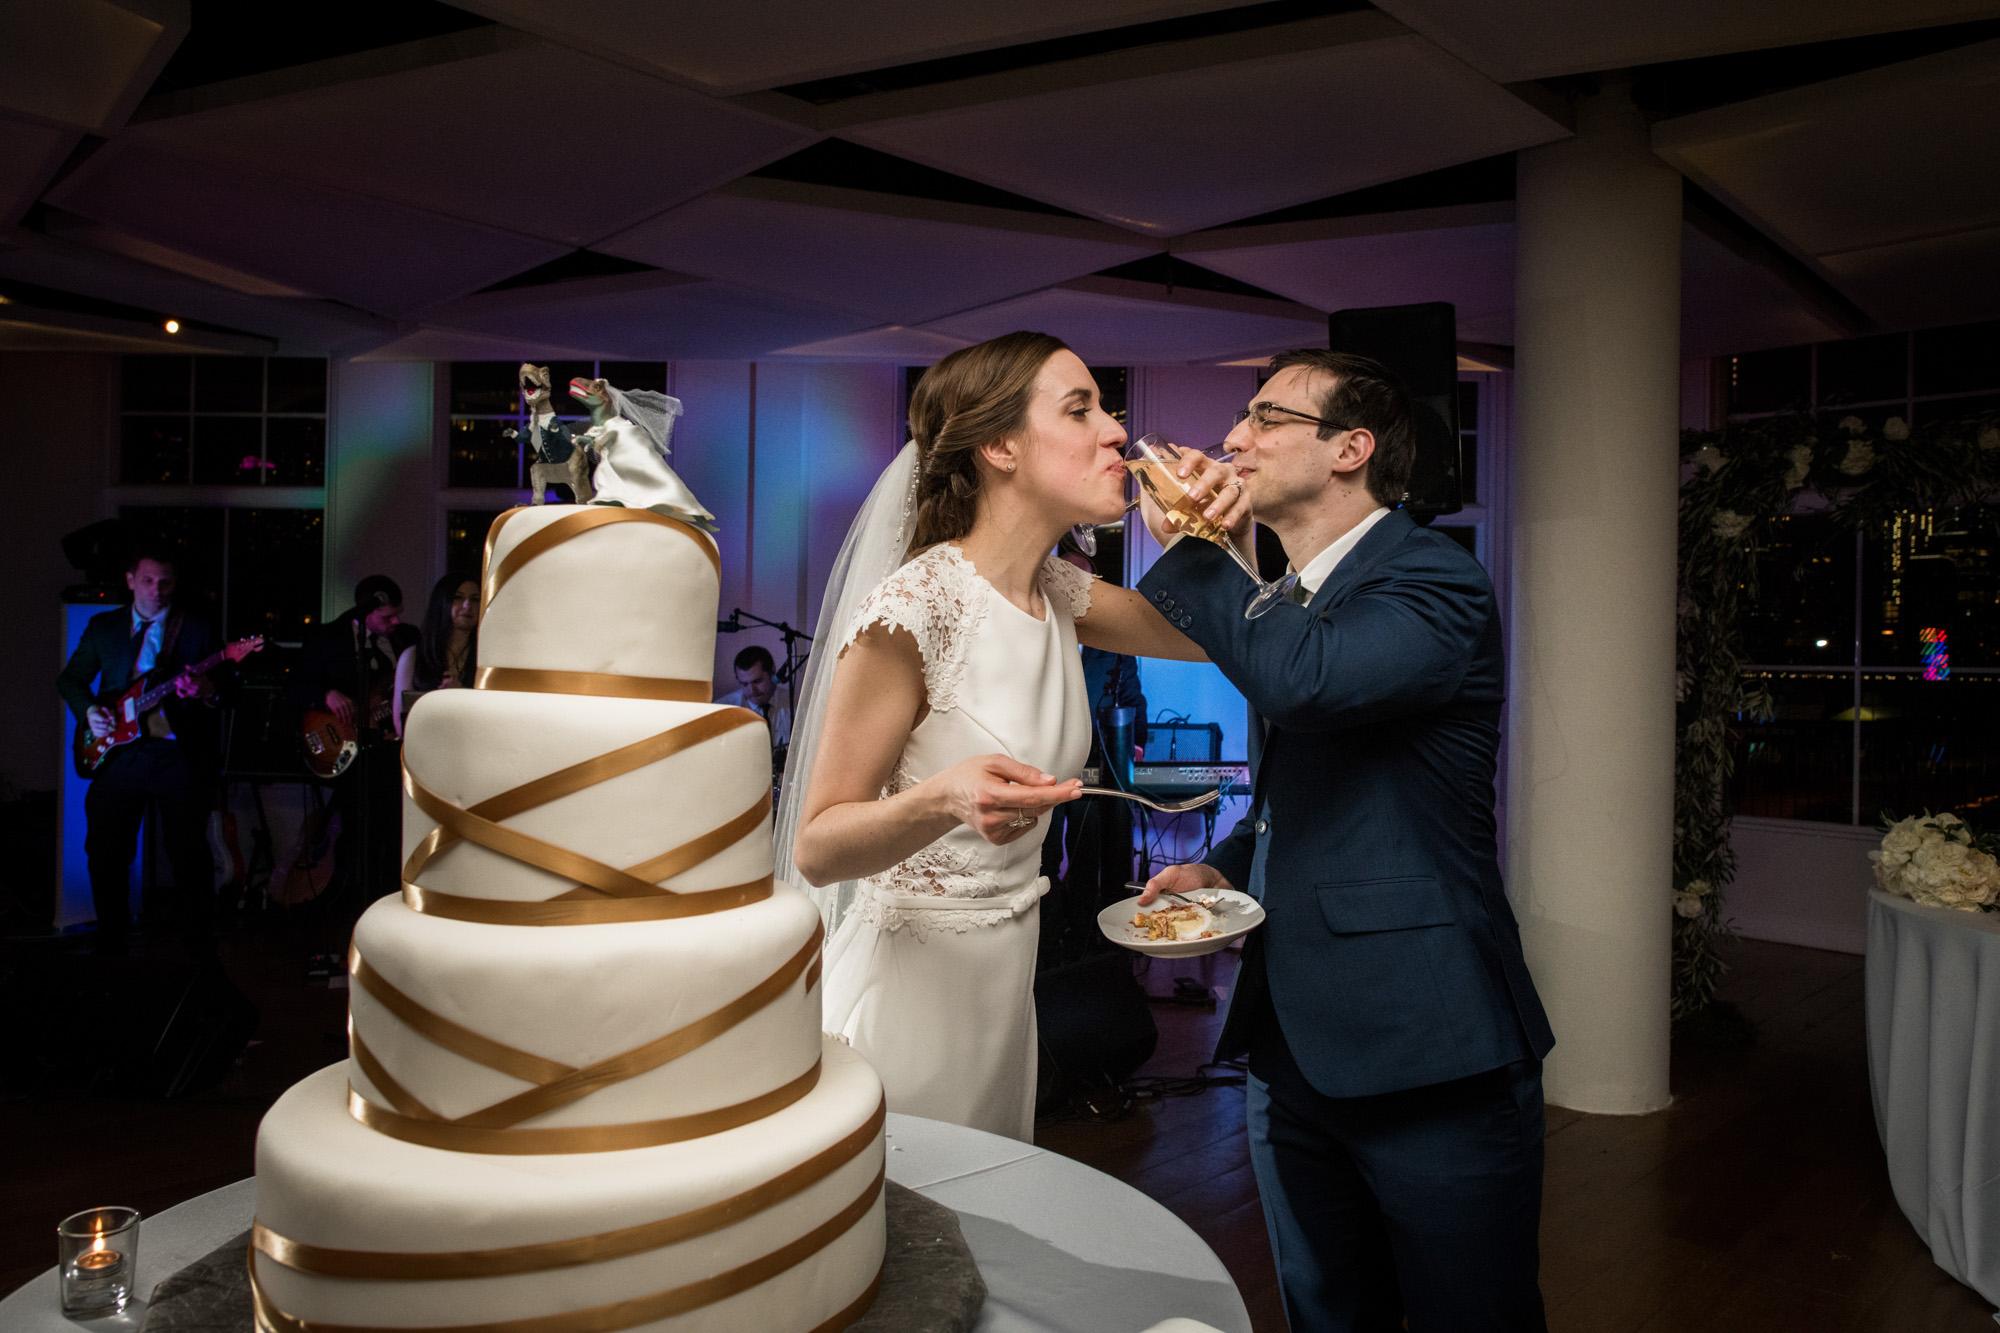 nj-wedding-photographer-maritime-parc-maria-david-51.jpg